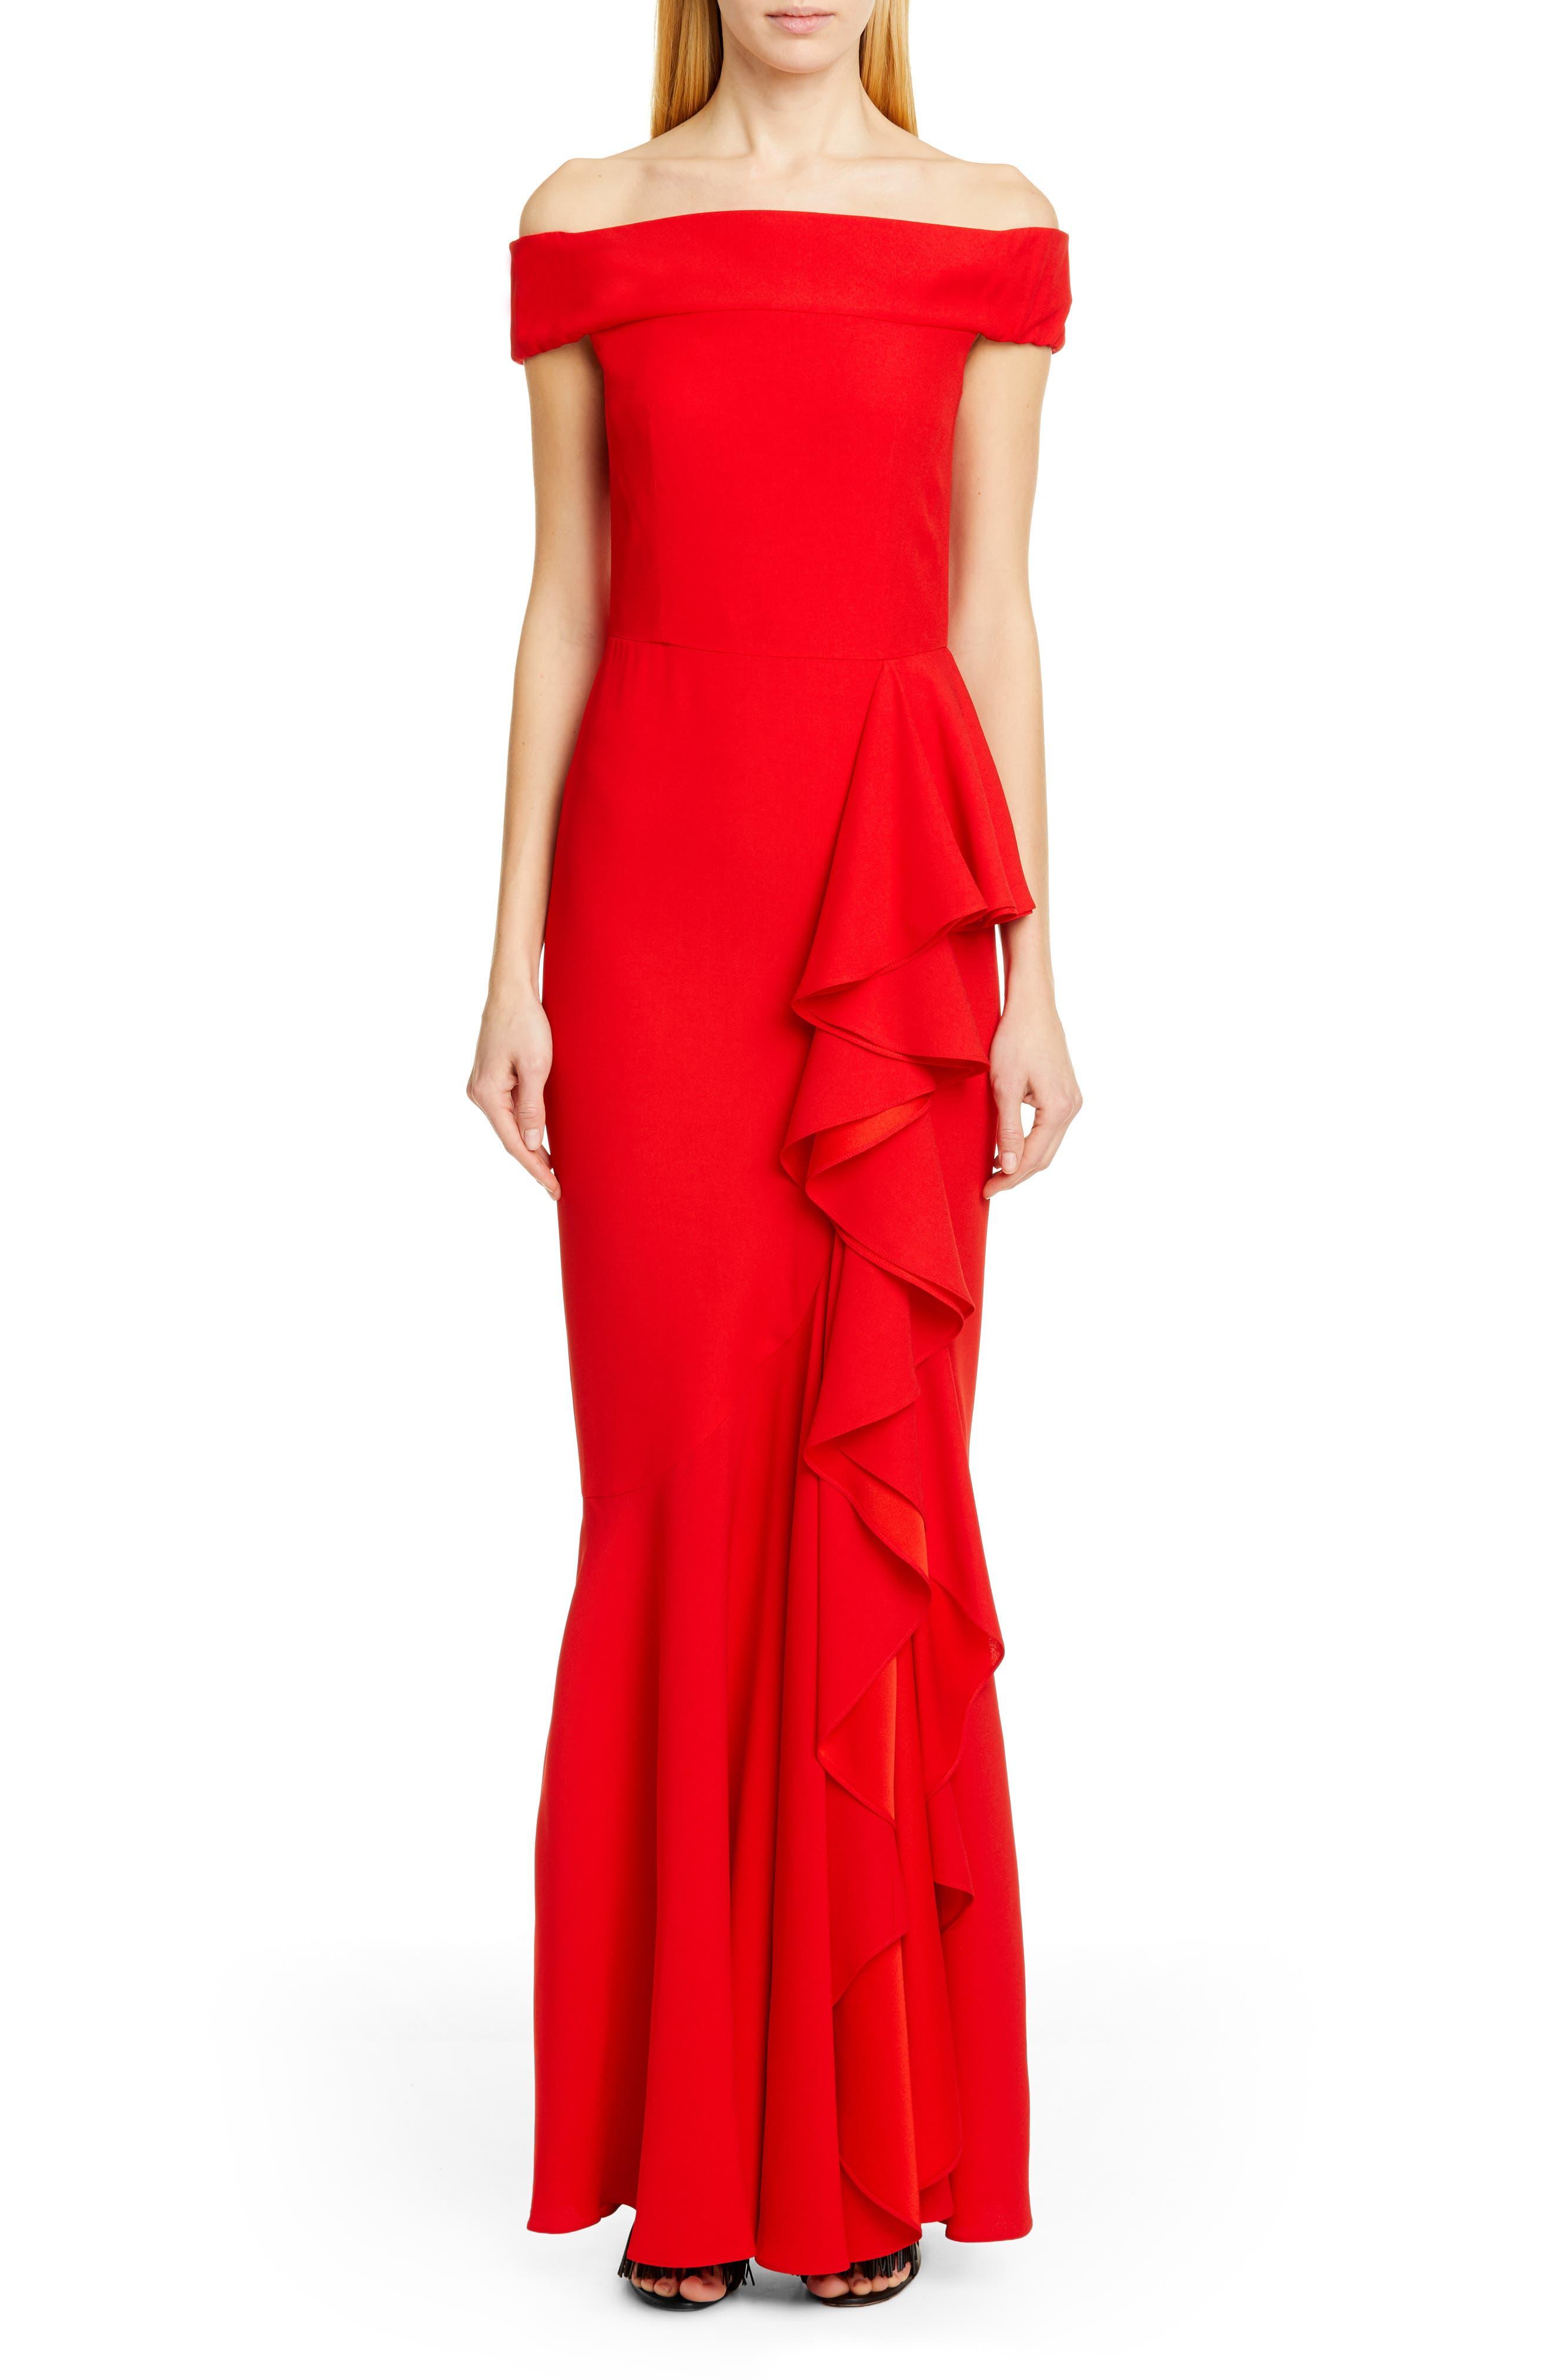 Alexander Mcqueen Ruffle Off The Shoulder Evening Dress, US / 46 IT - Red